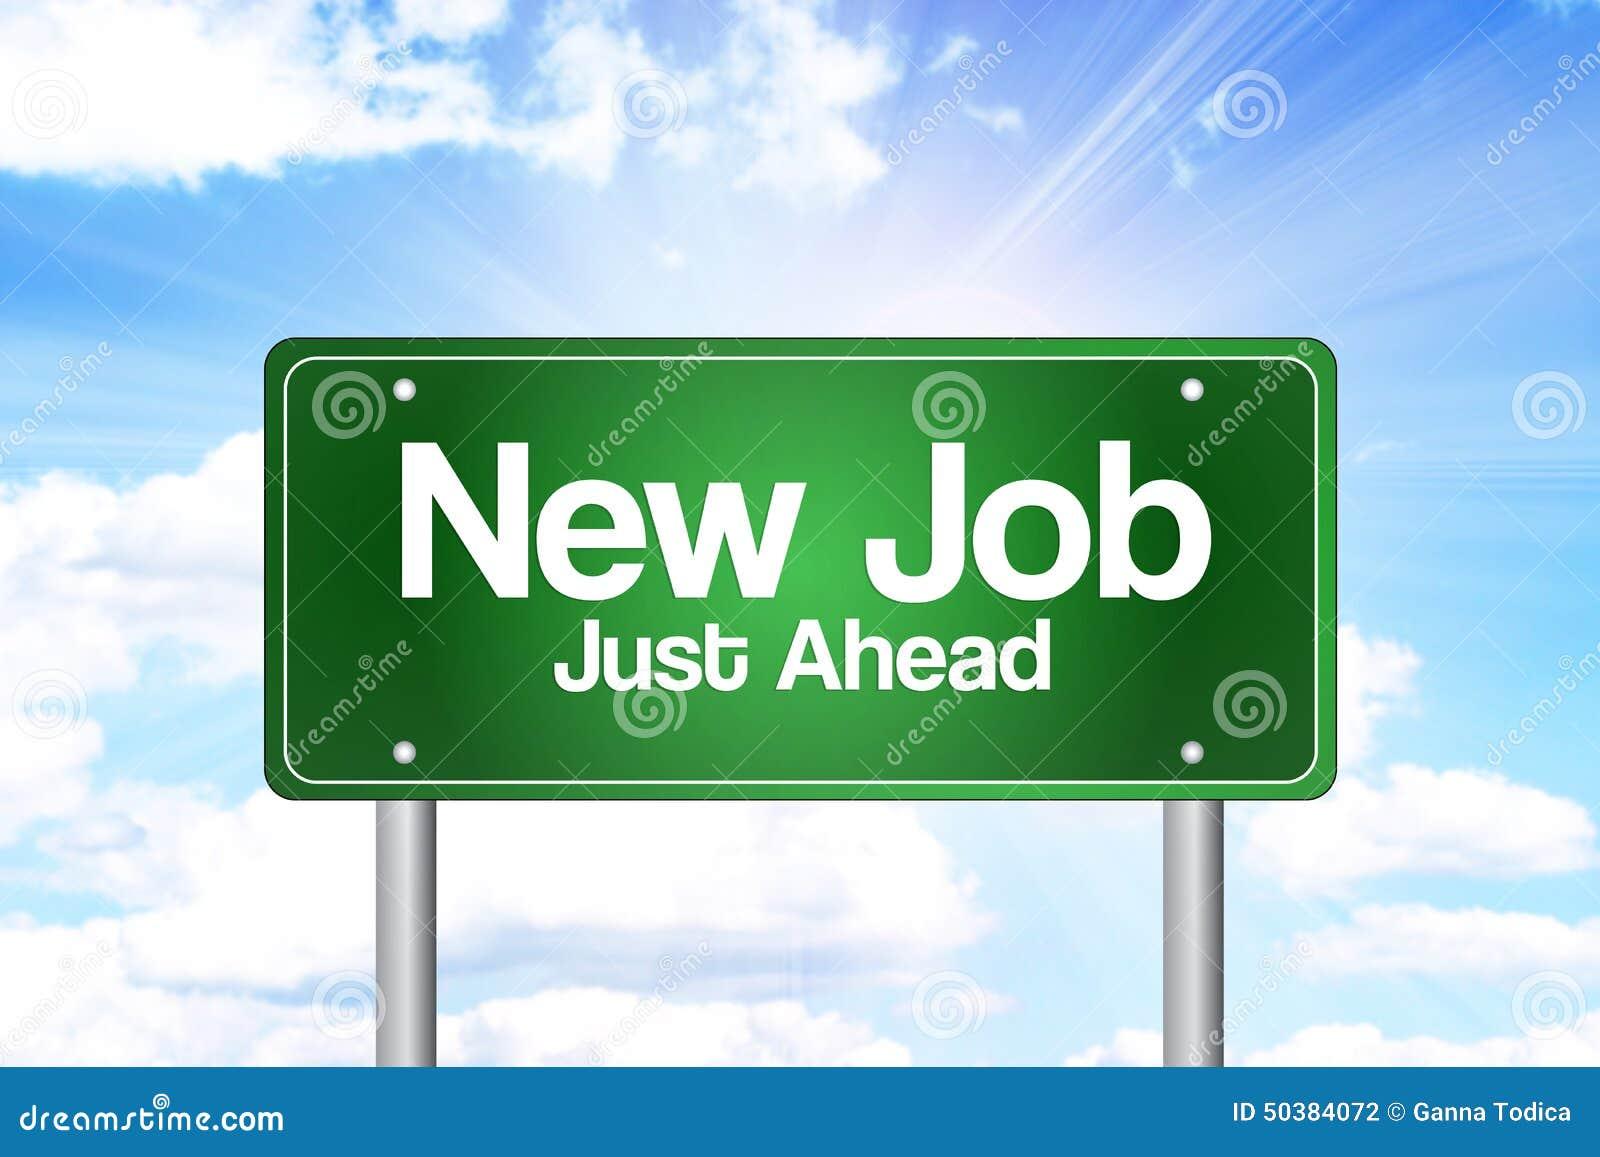 New Job, Just Ahead Green Road Sign, Business Concept